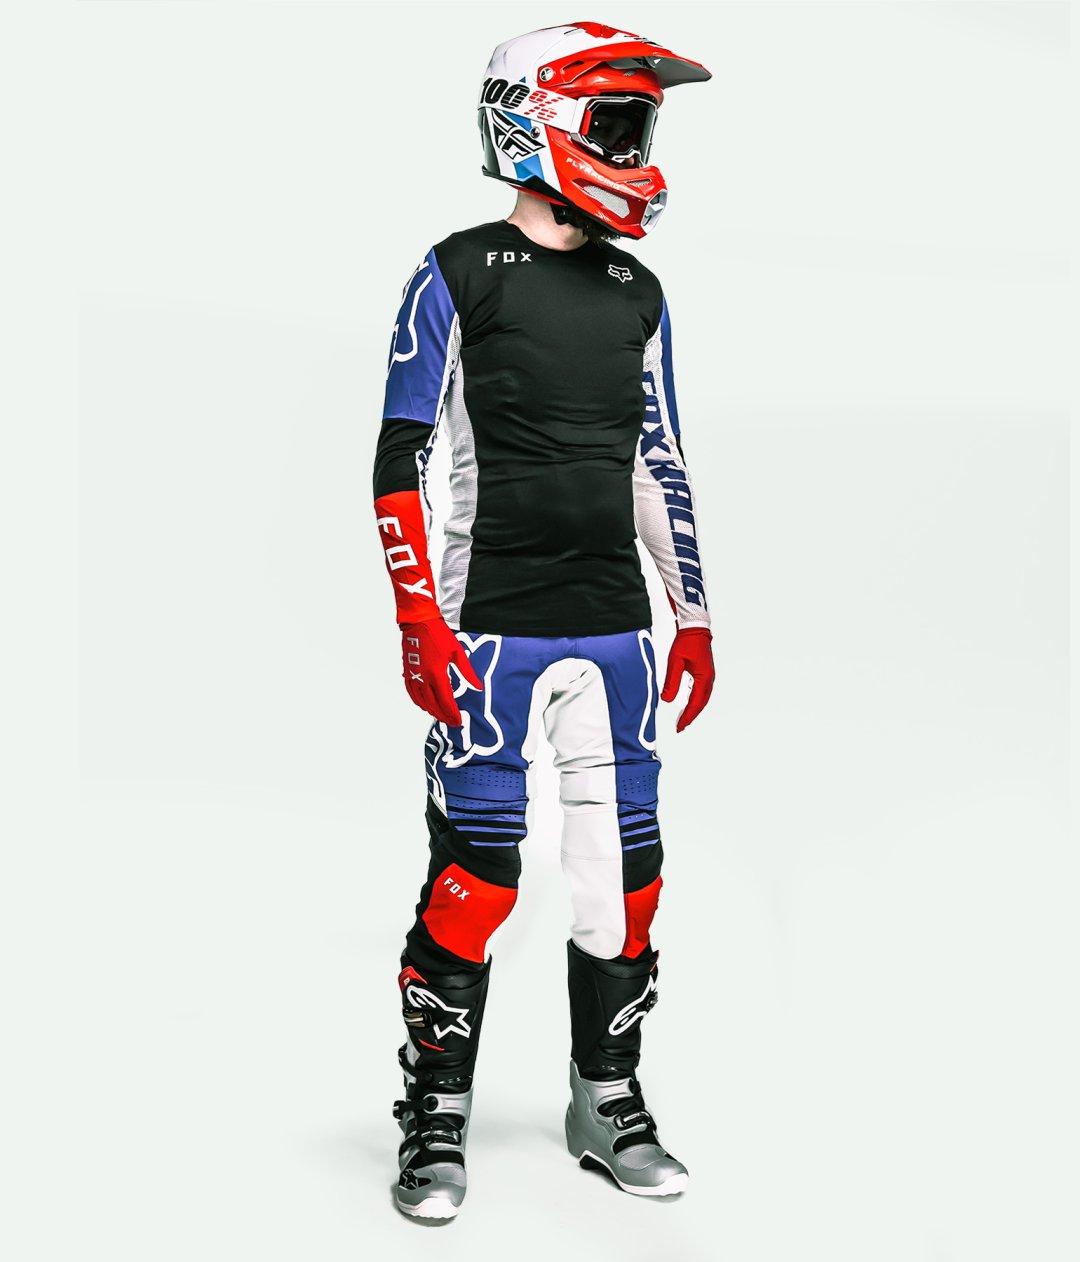 Best Dirt Bike Gear 2020 Top Picks From Helmets To Boots Revzilla